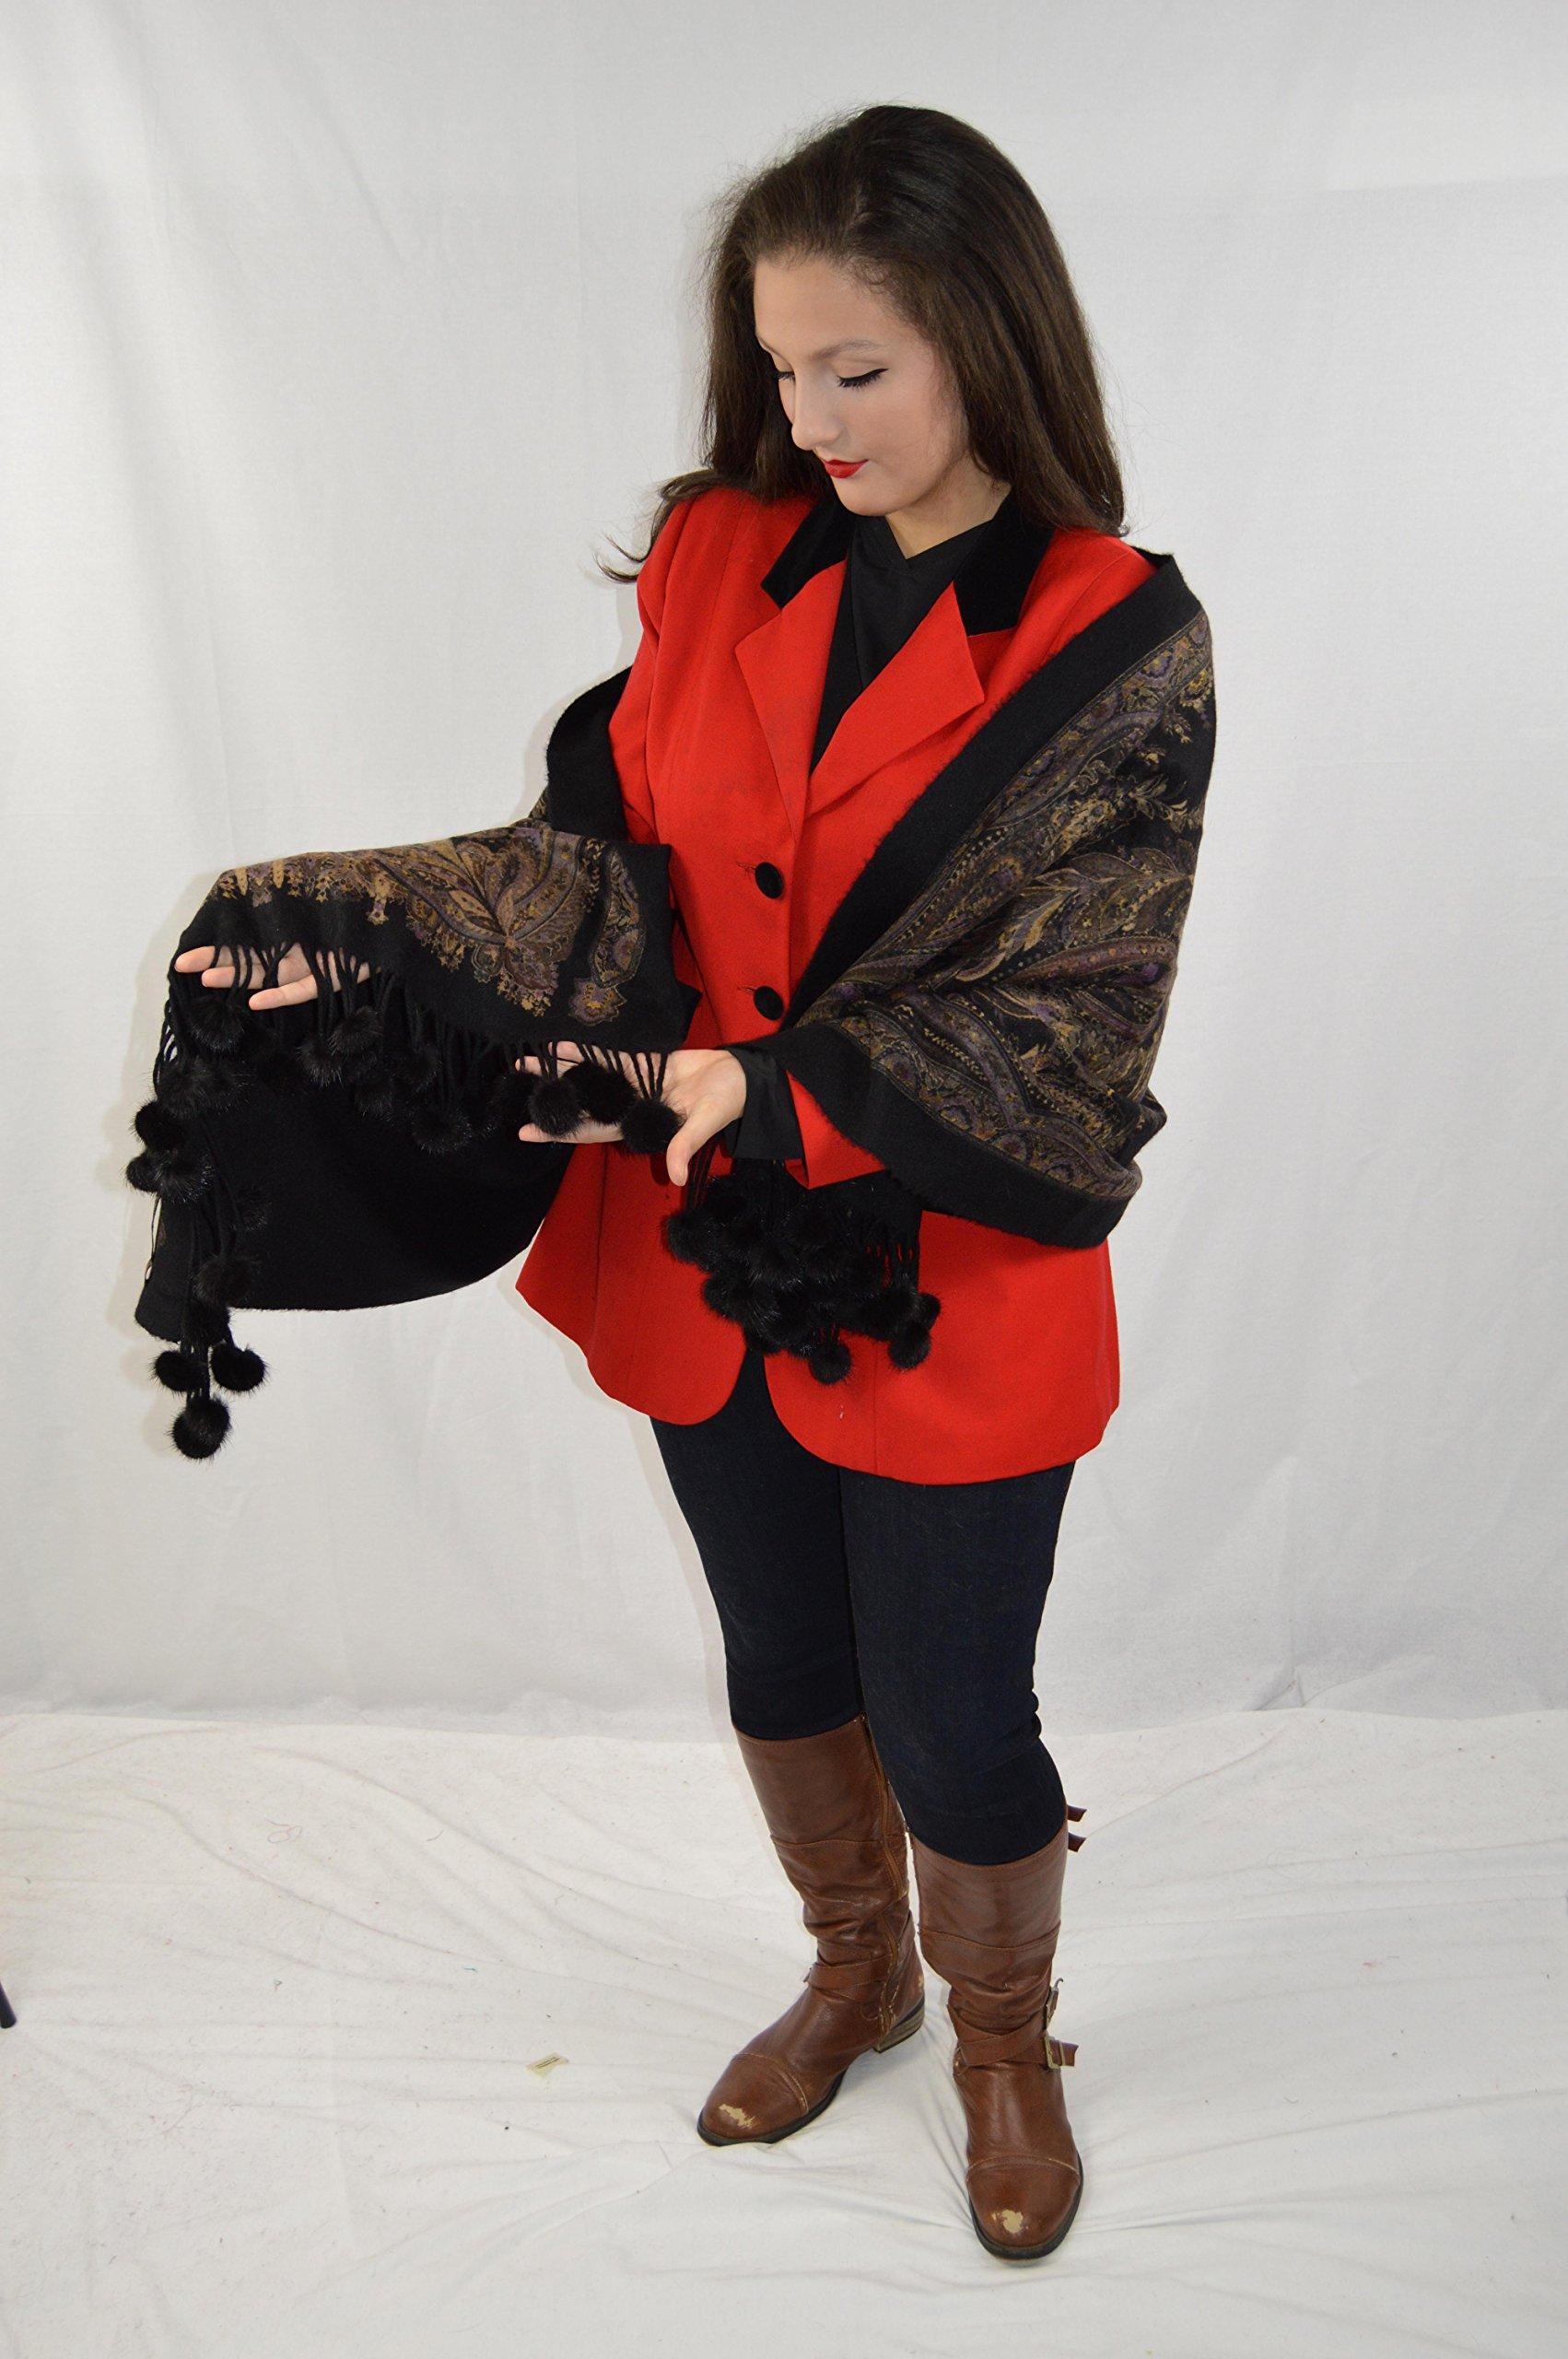 Cashmere Pashmina Group-Cashmere Shawl Scarf Wrap Stole (Solid/ Reversible Print w/ Genuine Fur) - Mink Black by Cashmere Pashmina Group (Image #6)